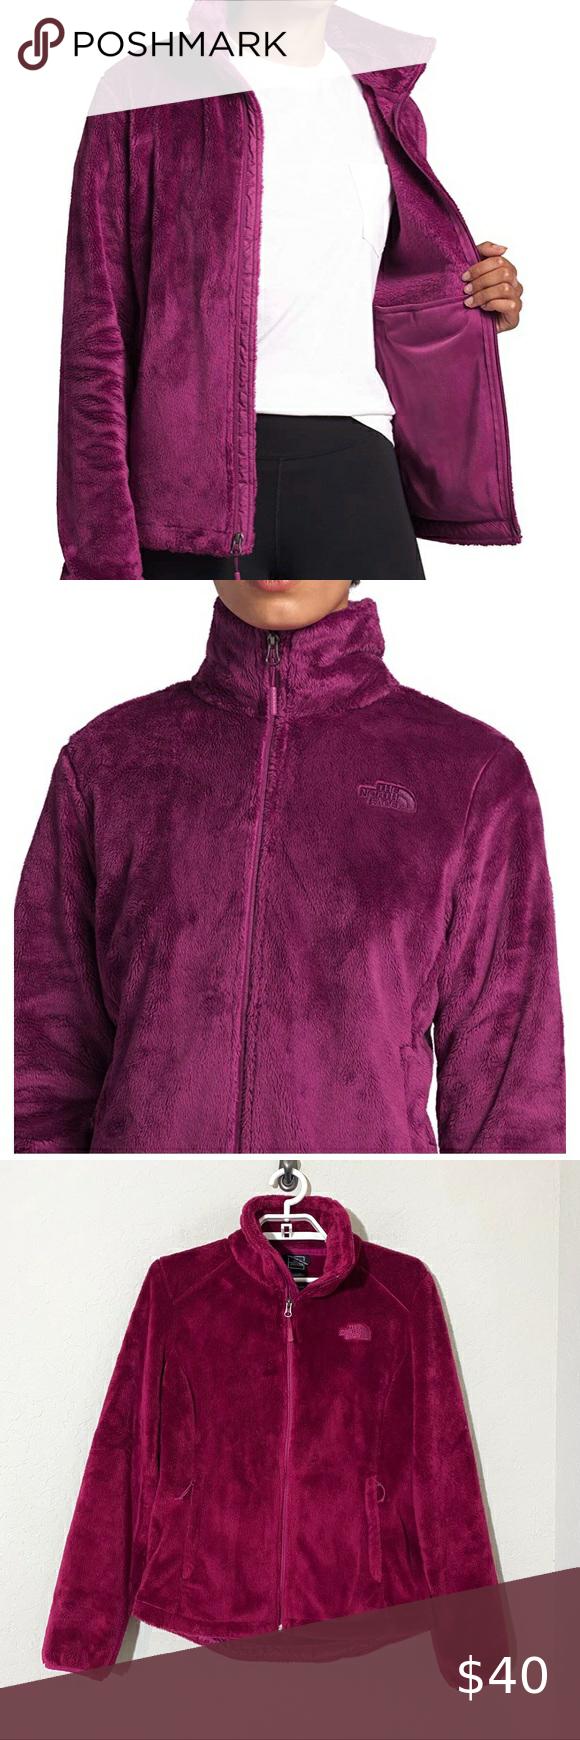 North Face Osito 2 Jacket Wild Aster Purple Sz M North Face Osito The North Face North Face Jacket [ 1740 x 580 Pixel ]